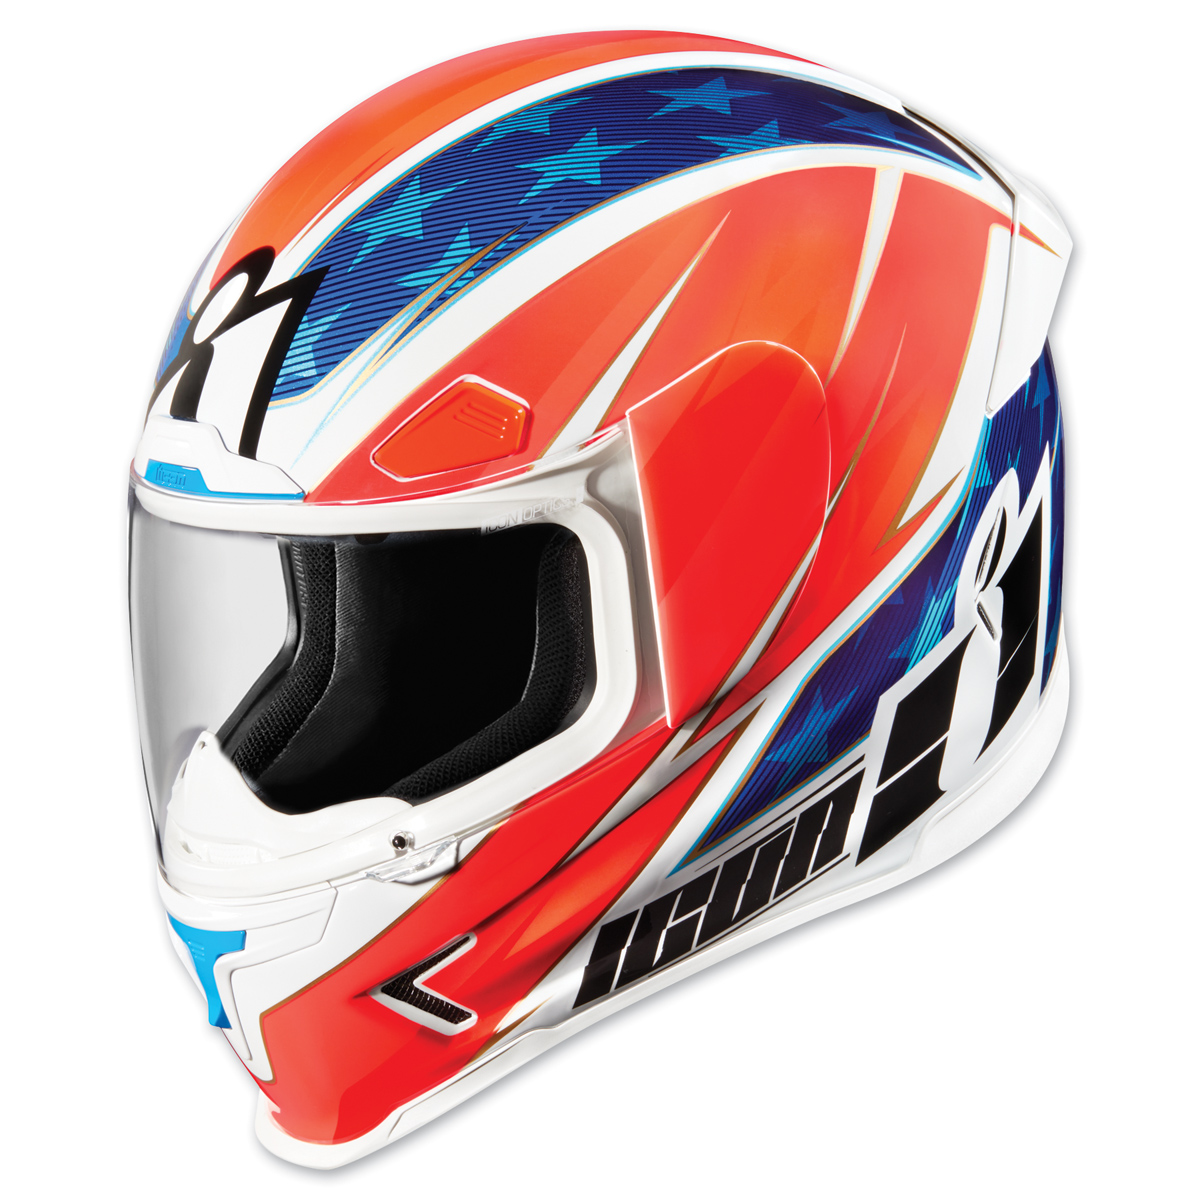 ICON Airframe Pro Maxflash Full Face Helmet